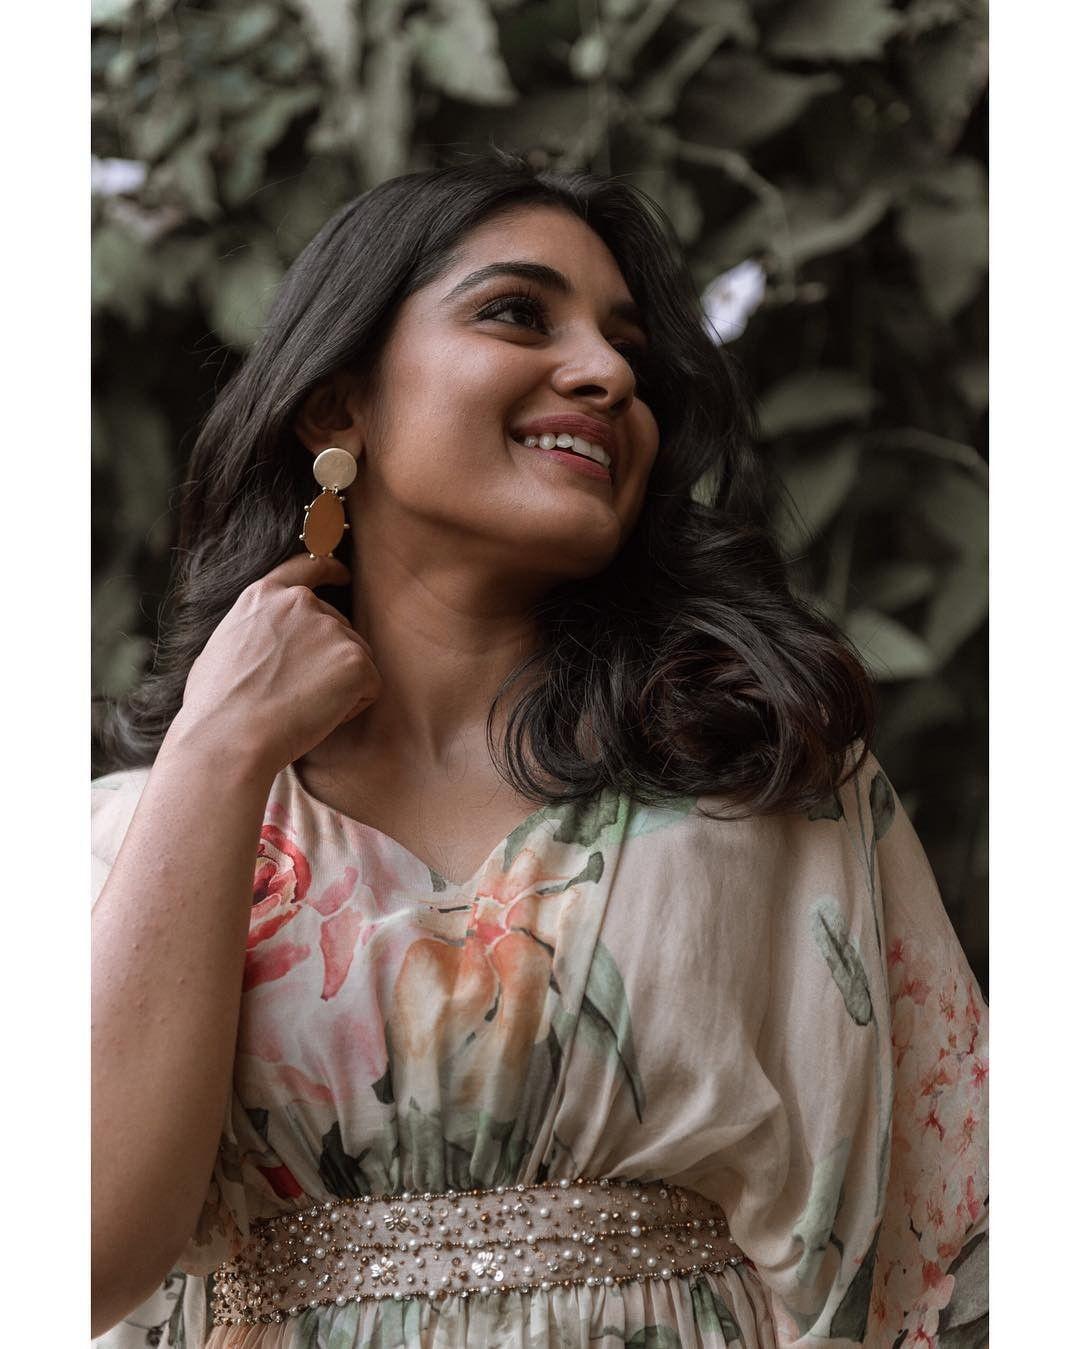 Pin by sweety sweety on Nivetha thomas Actresses, Buy